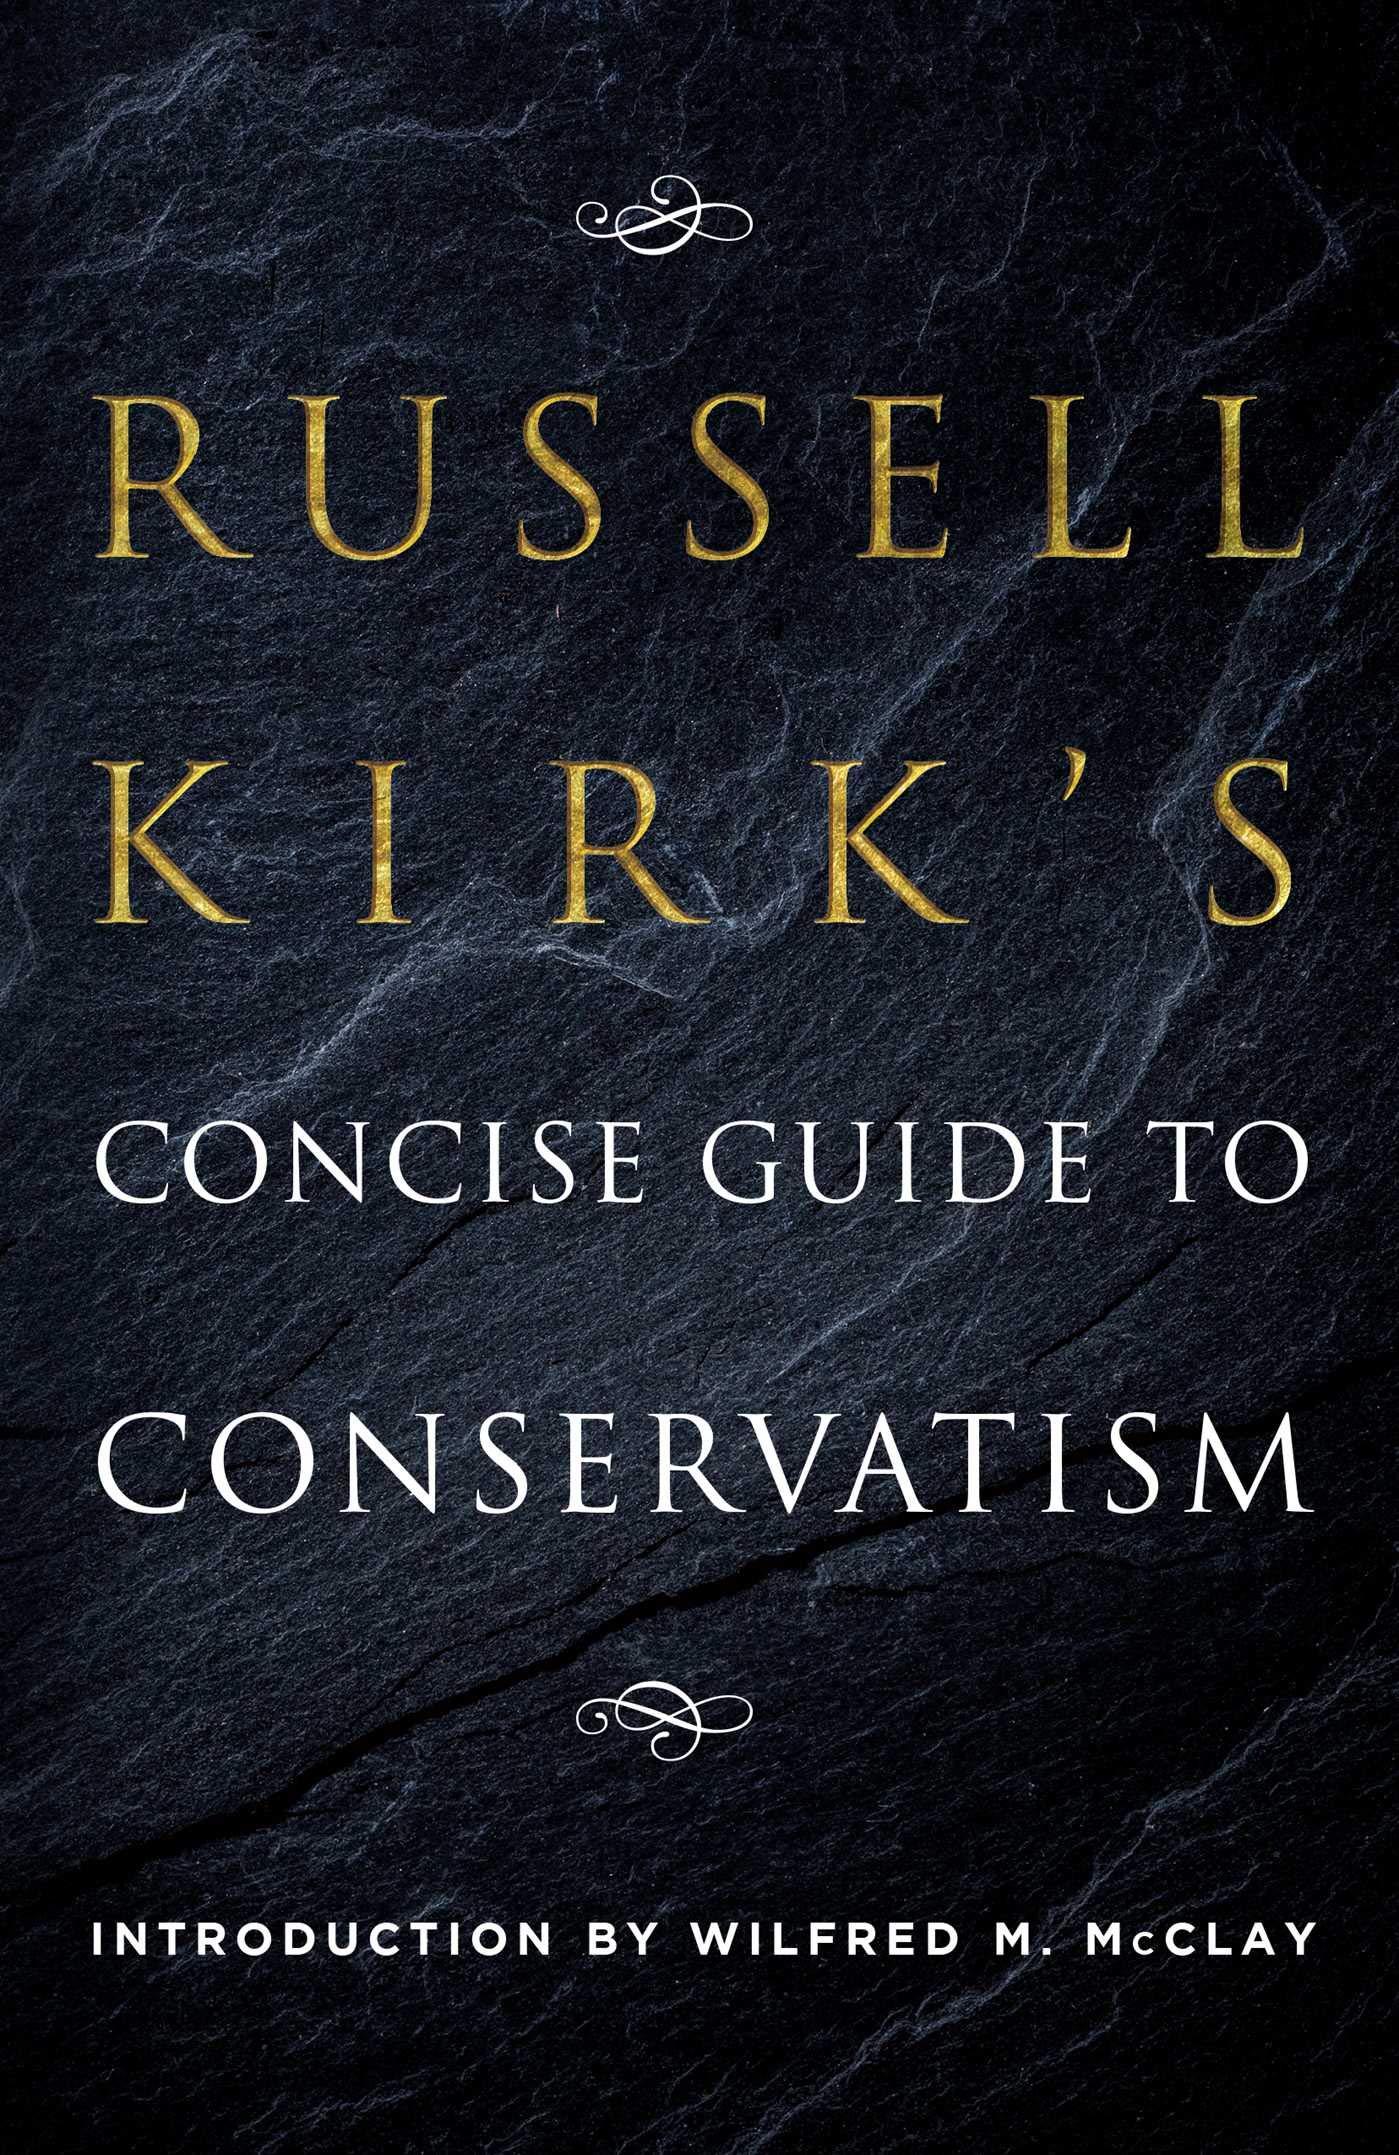 kirk concise guide.jpg